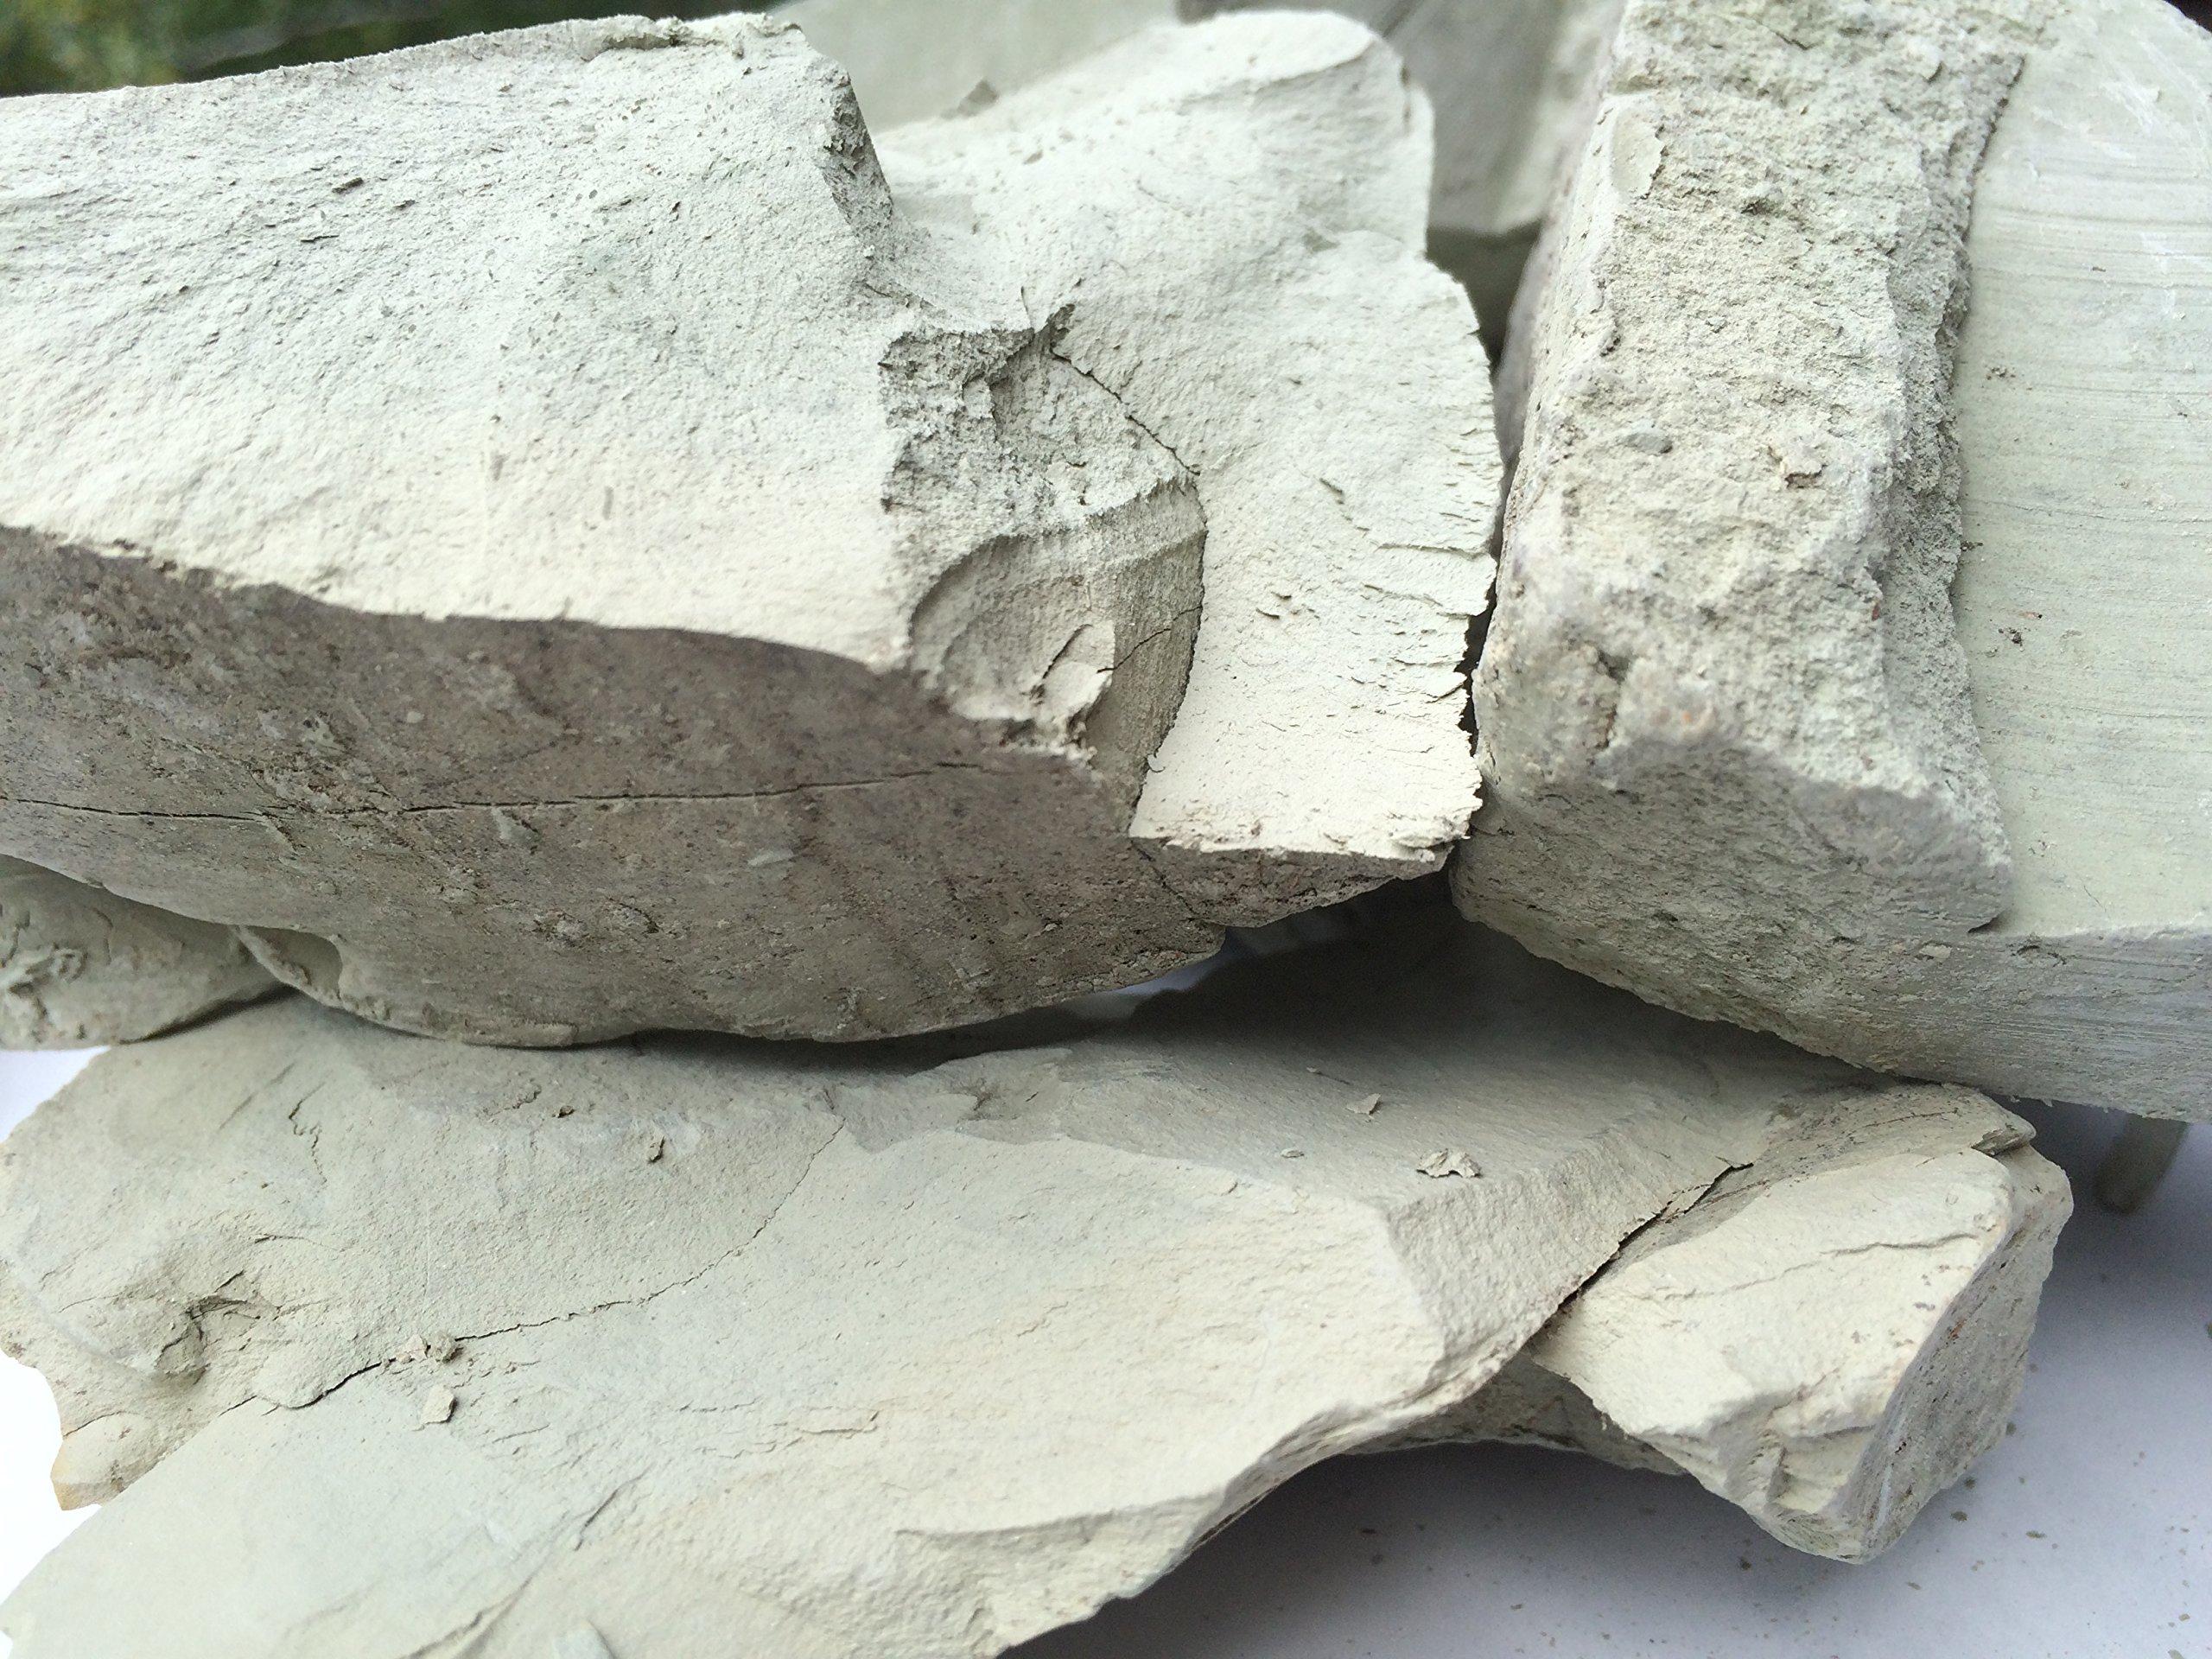 Sapphire Edible Clay Chunks (lump) Natural for Eating (Food), 4 oz (113 g)